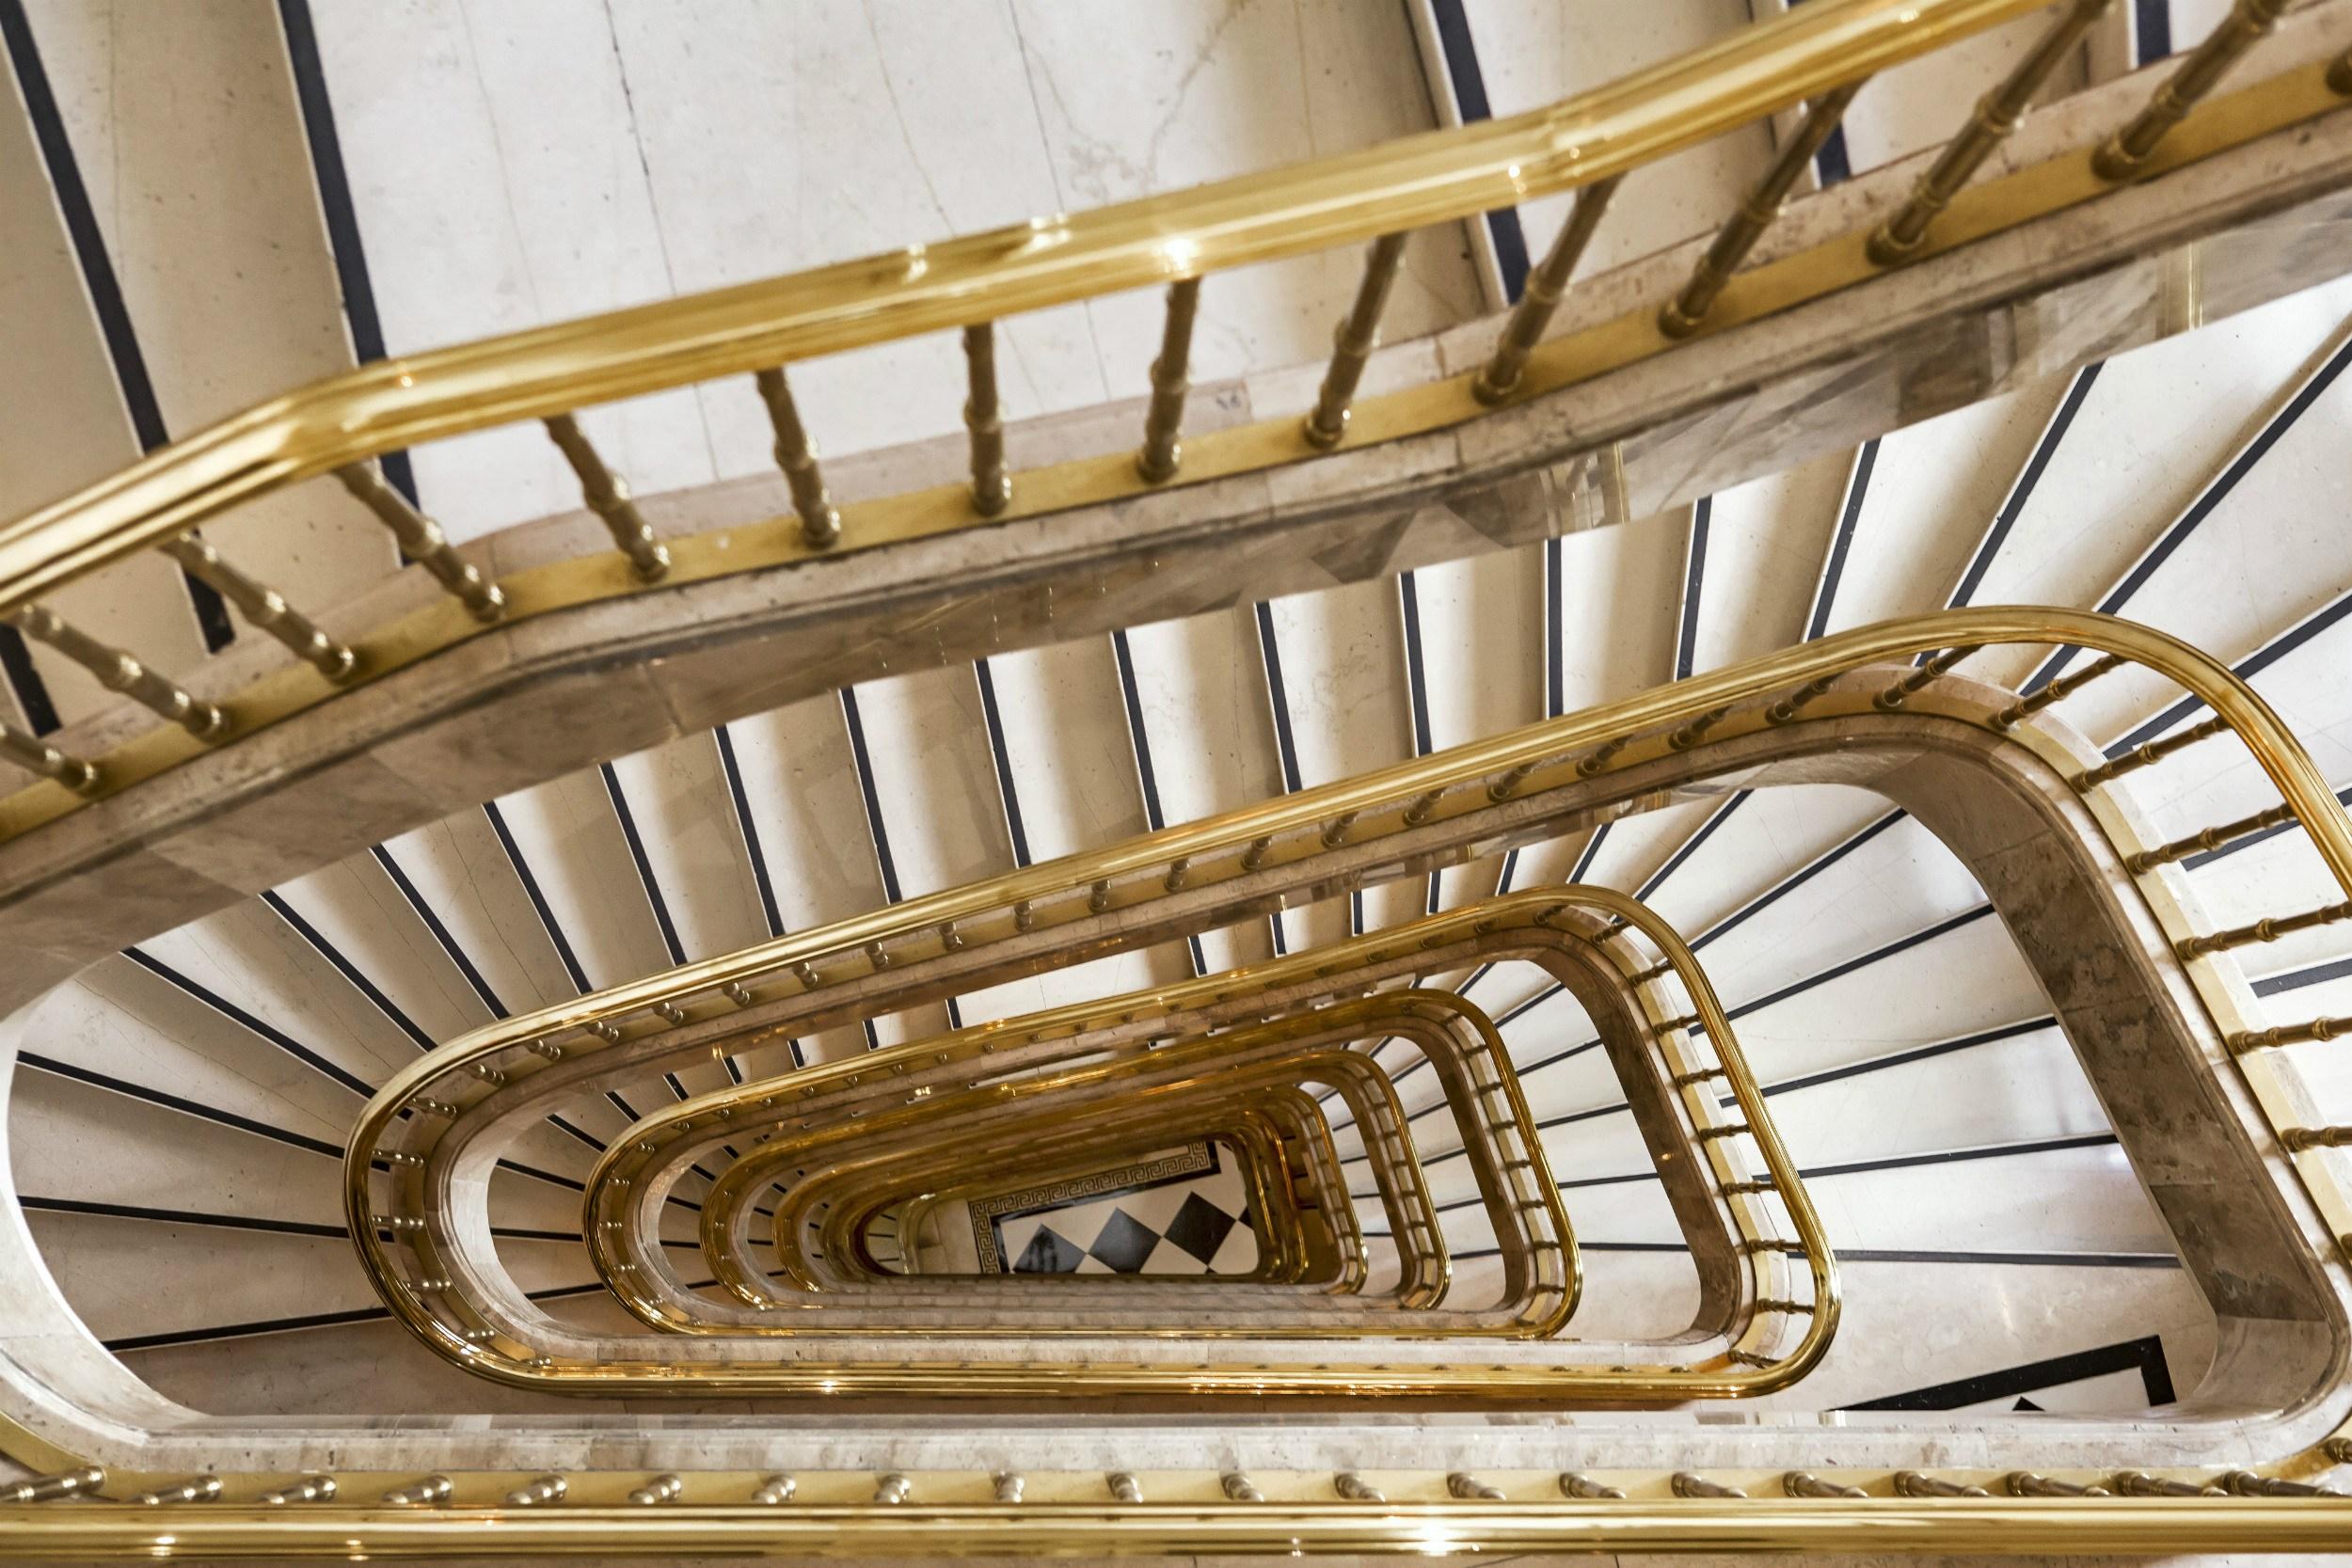 The original main staircase balustrade of Hotel Grande Bretagne in Athens